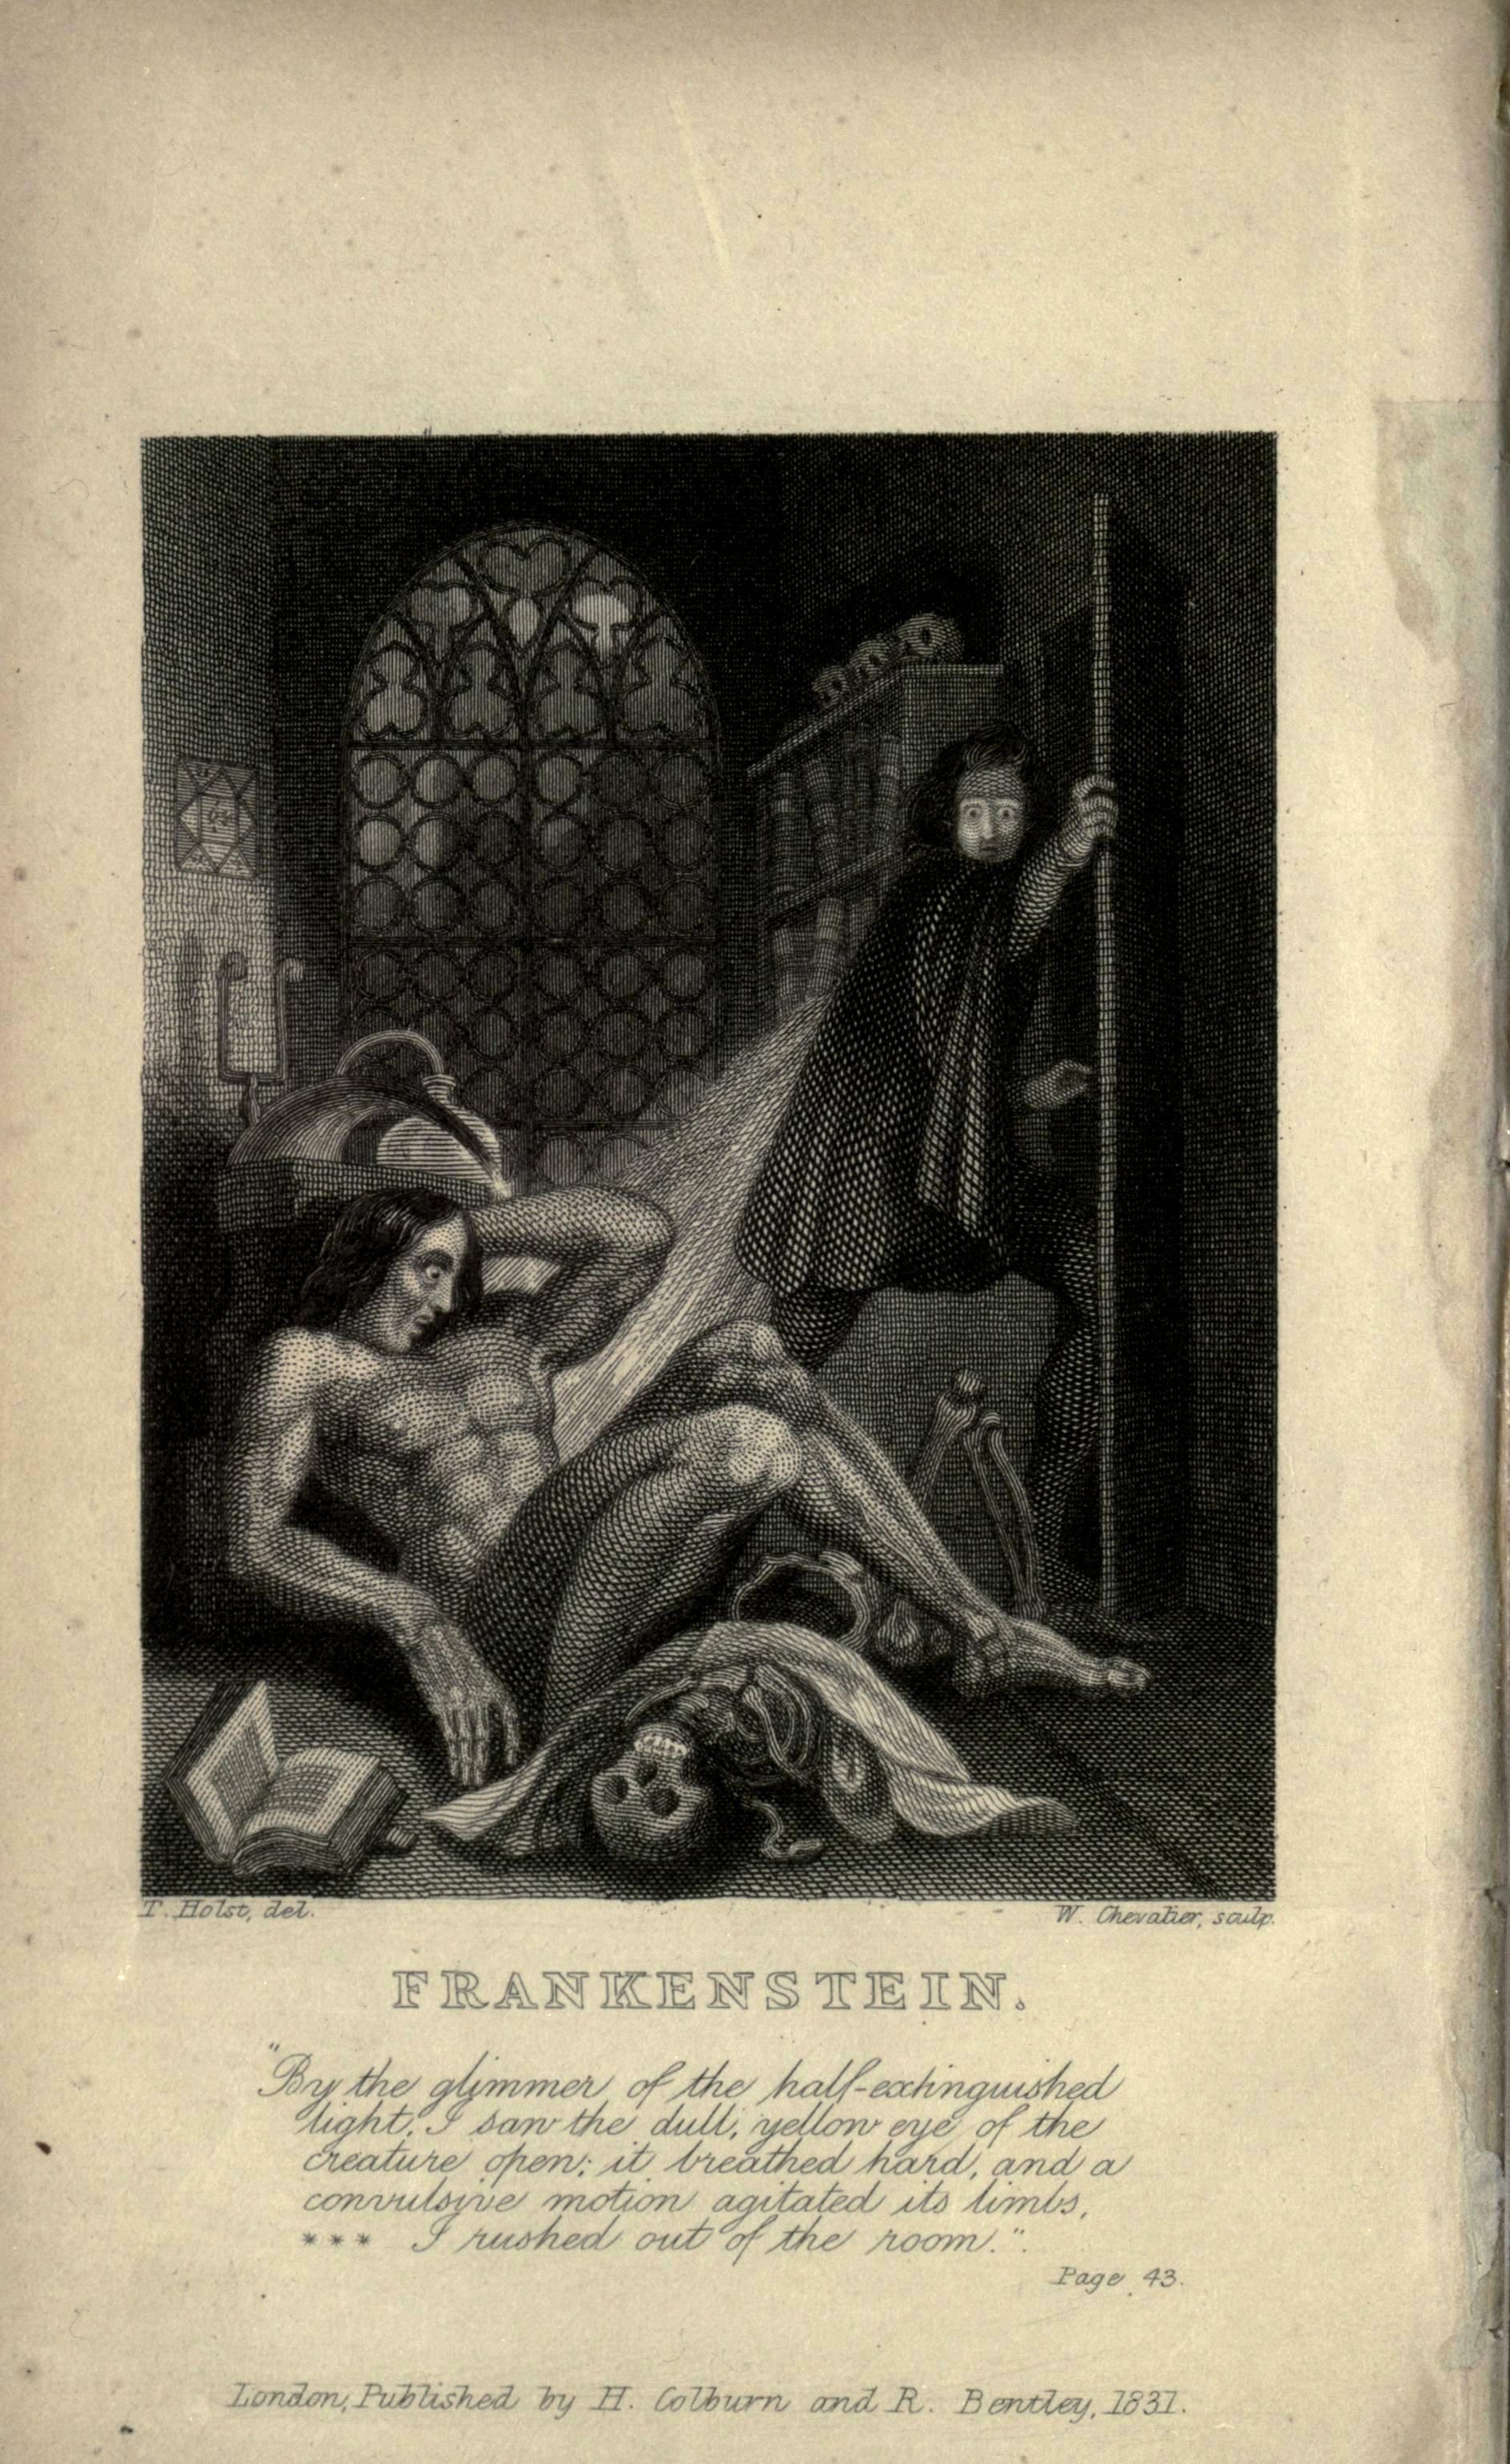 Shelley,Mary Wollstonecraft. Frankenstein . London:Lackington, Hughes, Harding, Mavor & Jones, 1818.